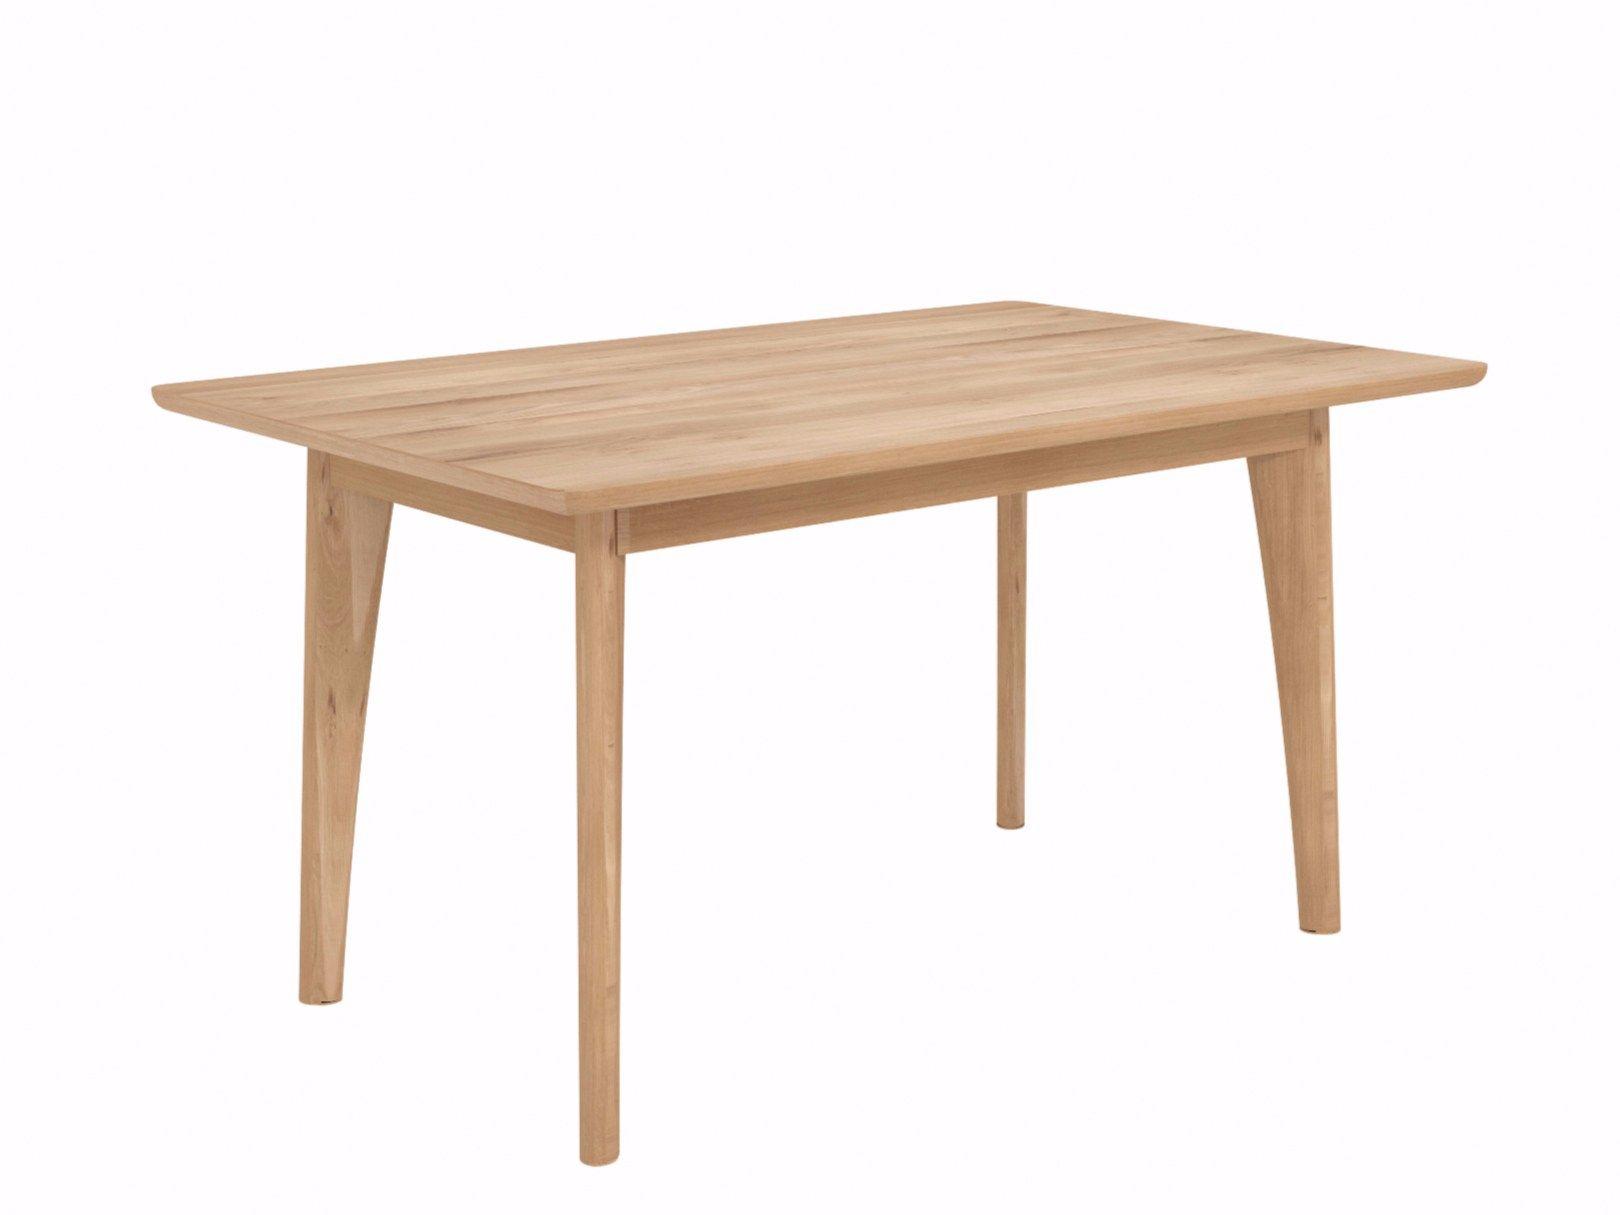 100 table basse ethnicraft naomi ethnicraft oak for Table basse ethnicraft